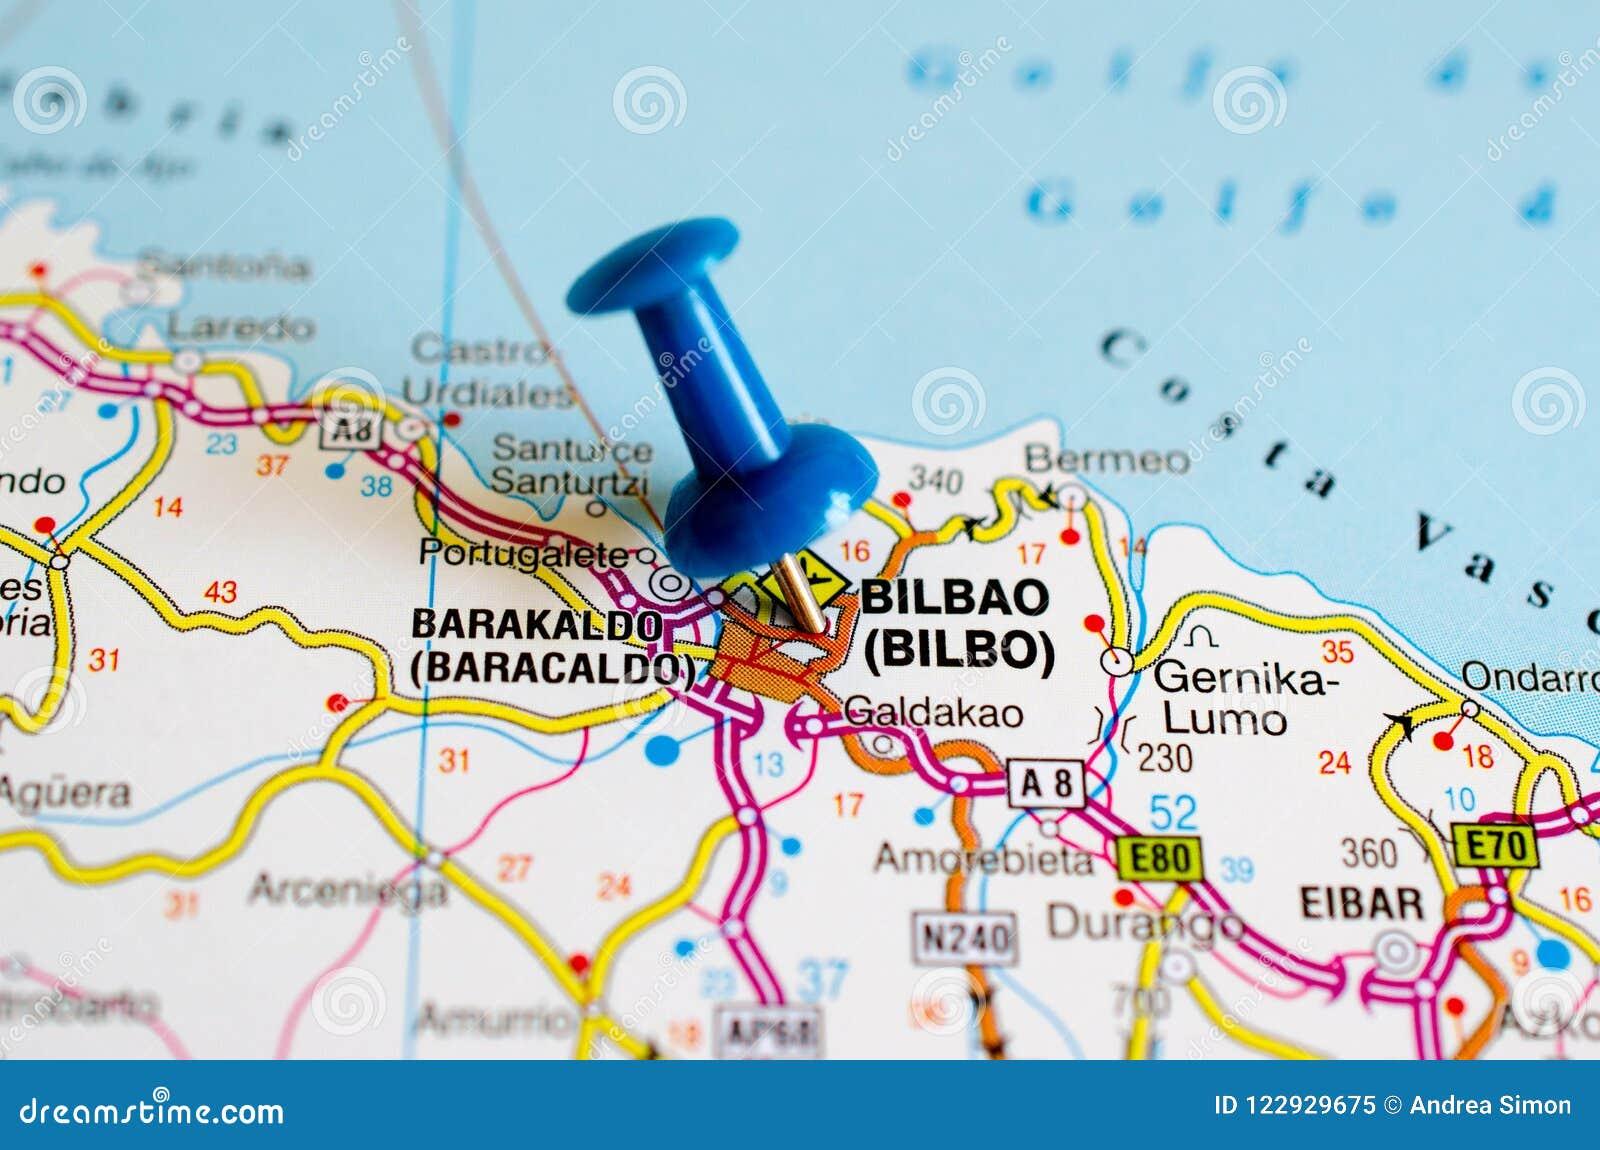 Mapa De Bilbao España.Bilbao Mapa Detraiteurvannederland